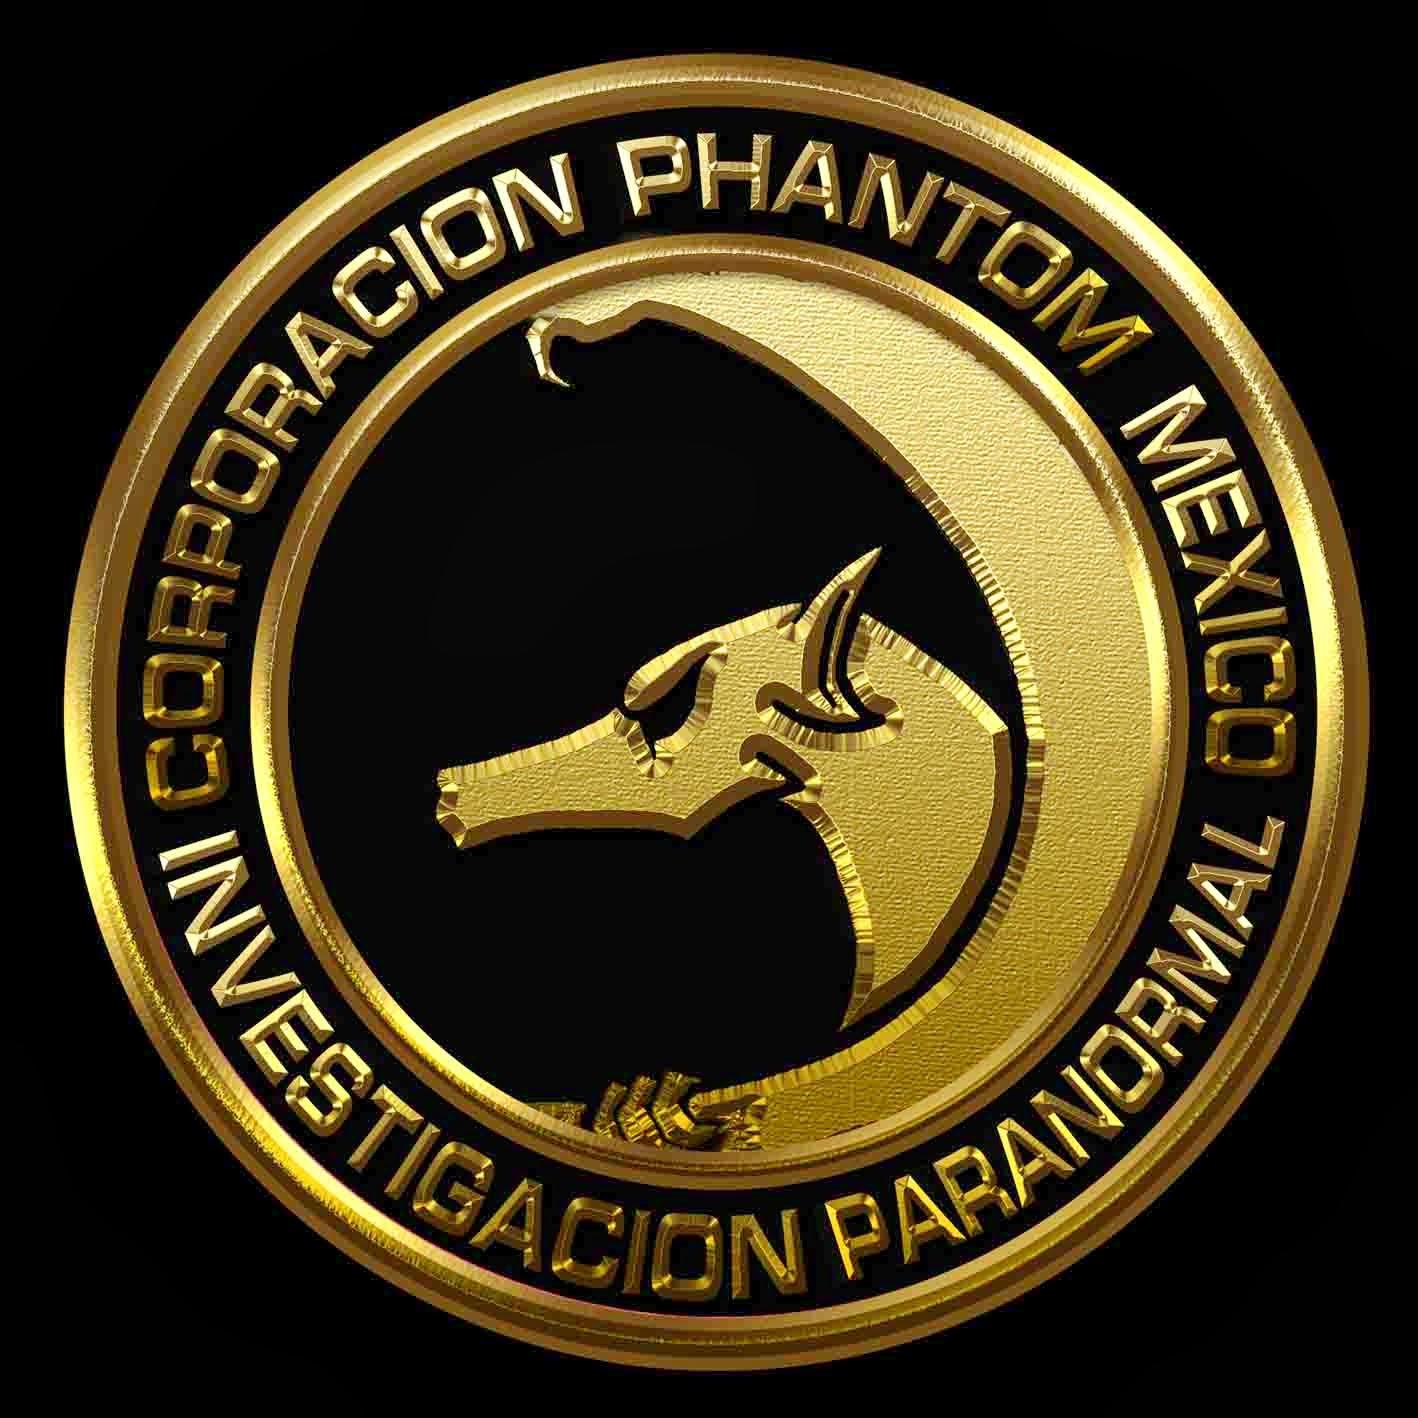 CORPORACION PHANTOM